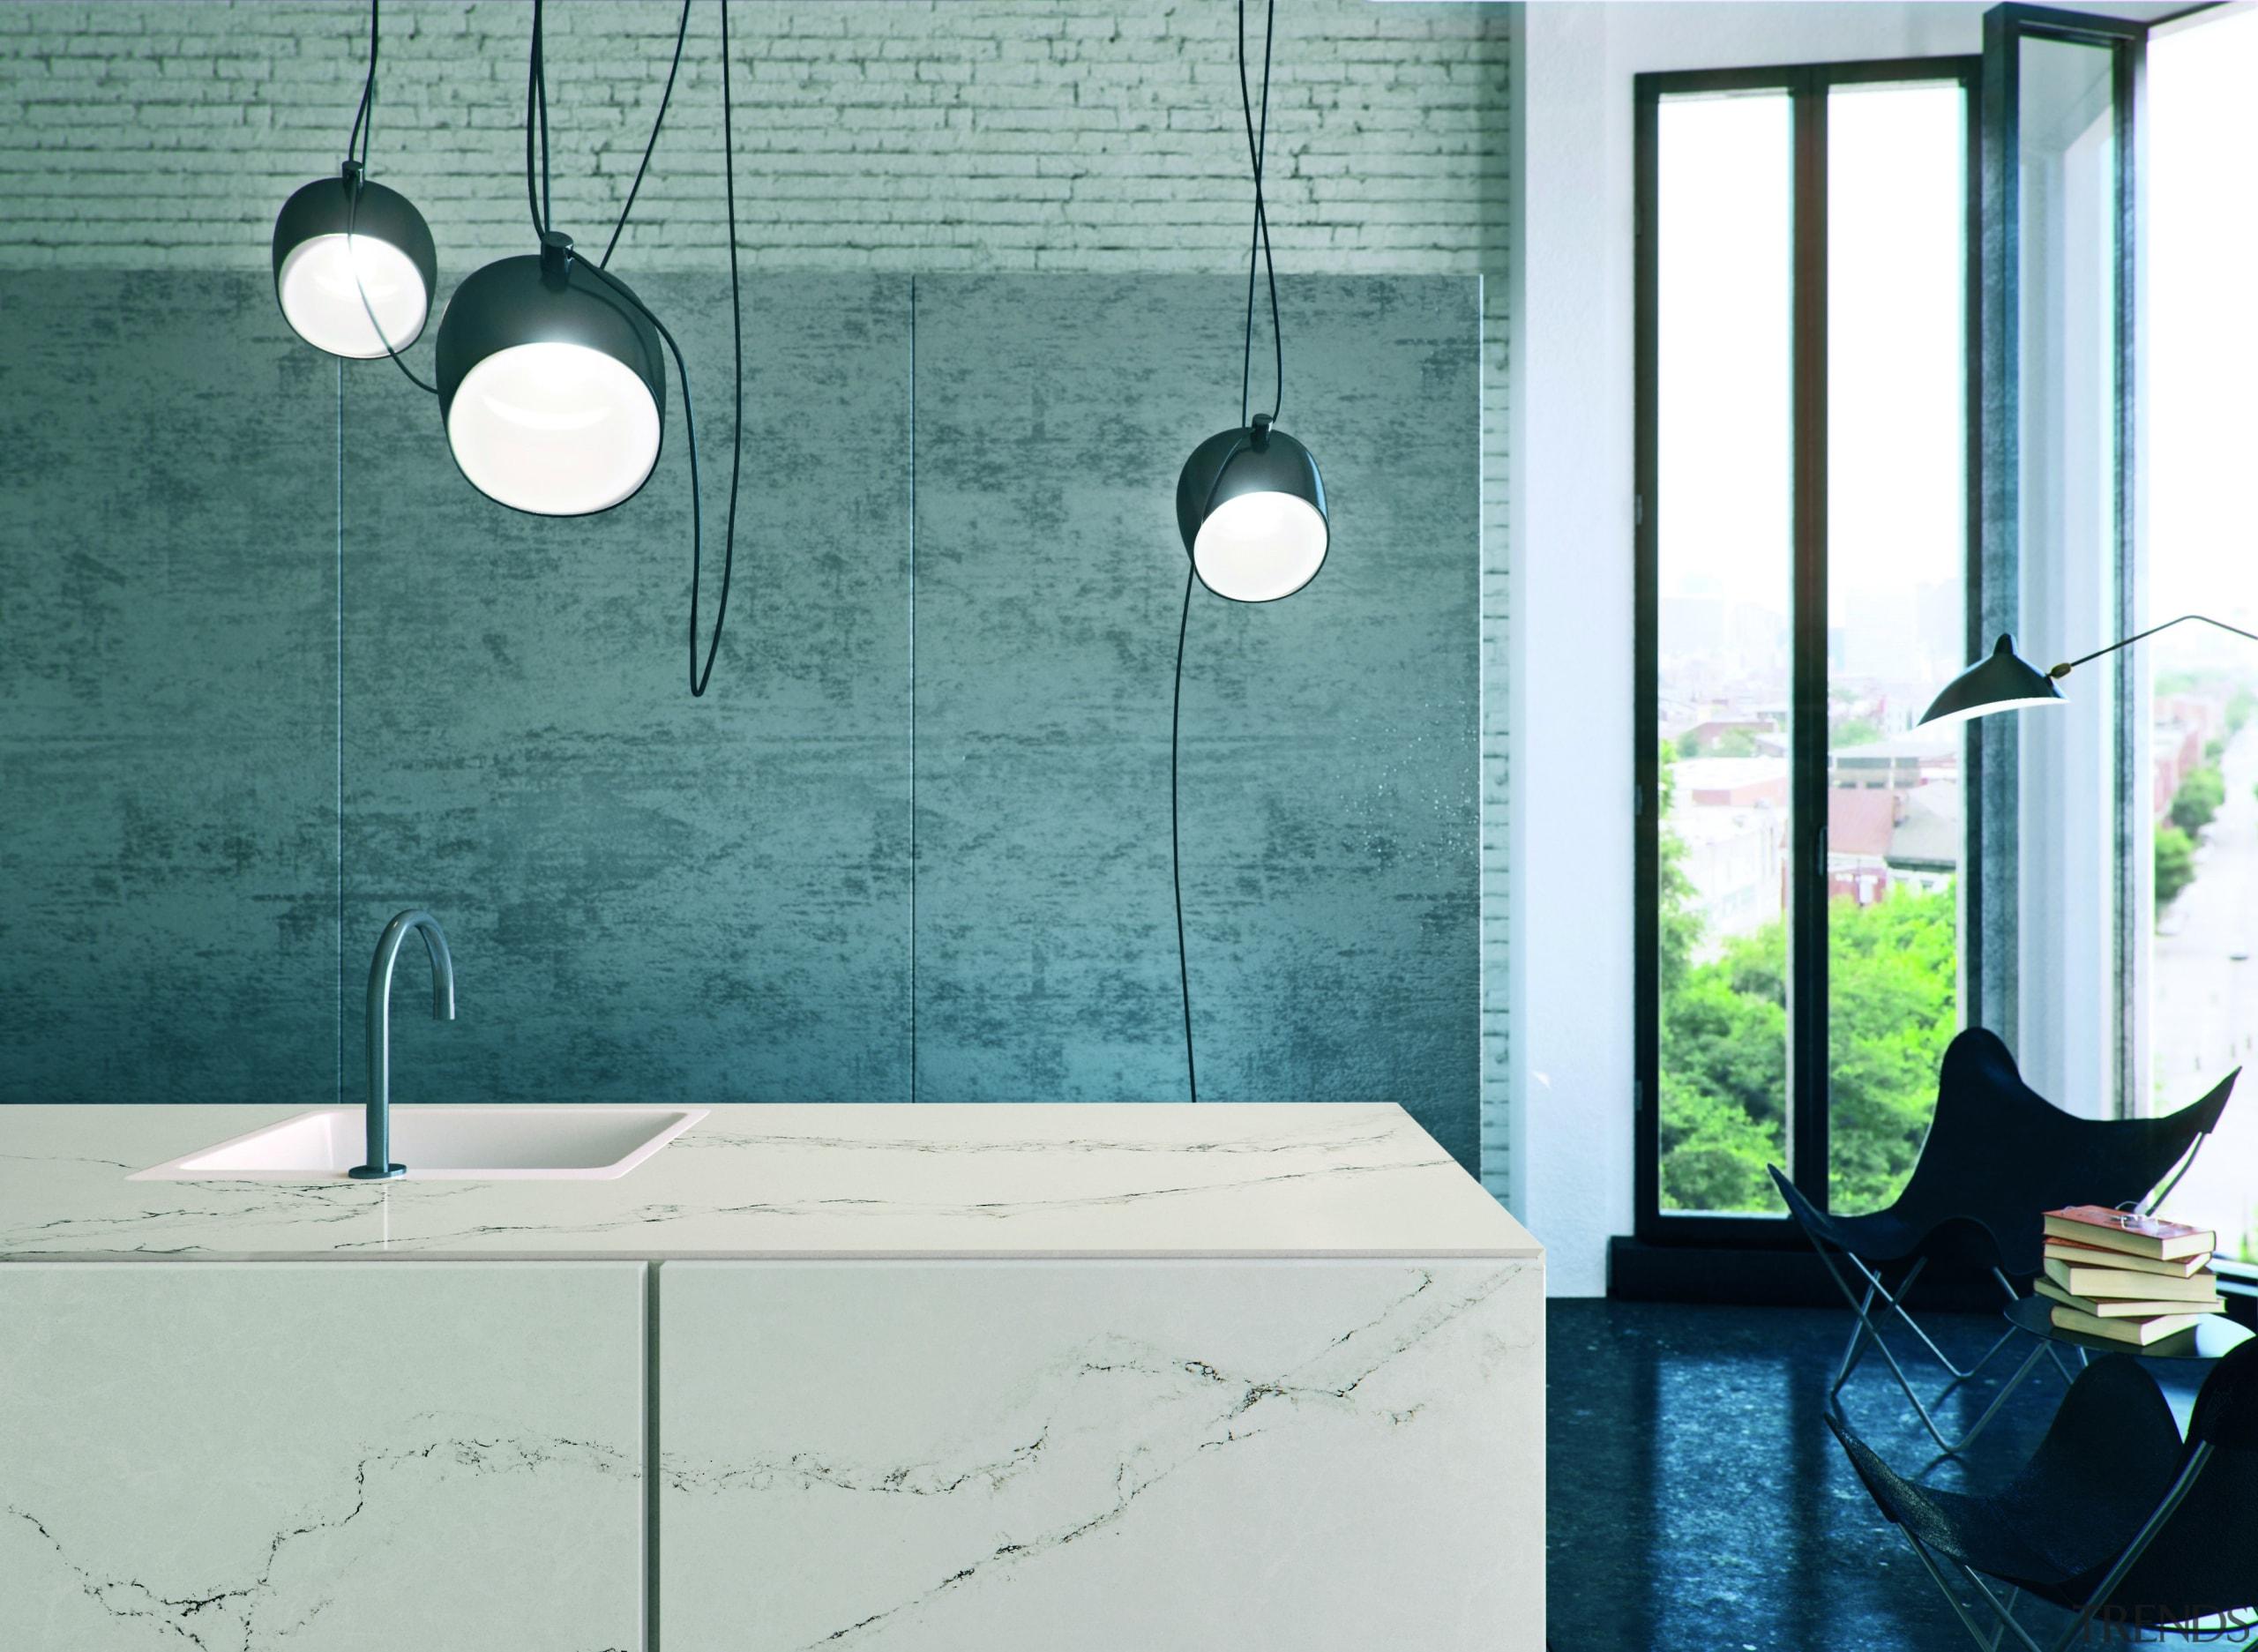 Caesarstone's interpretation of Statuario marble; Statuario Nuvo brings bathroom, floor, glass, interior design, light fixture, lighting, plumbing fixture, product design, sink, tap, tile, wall, teal, white